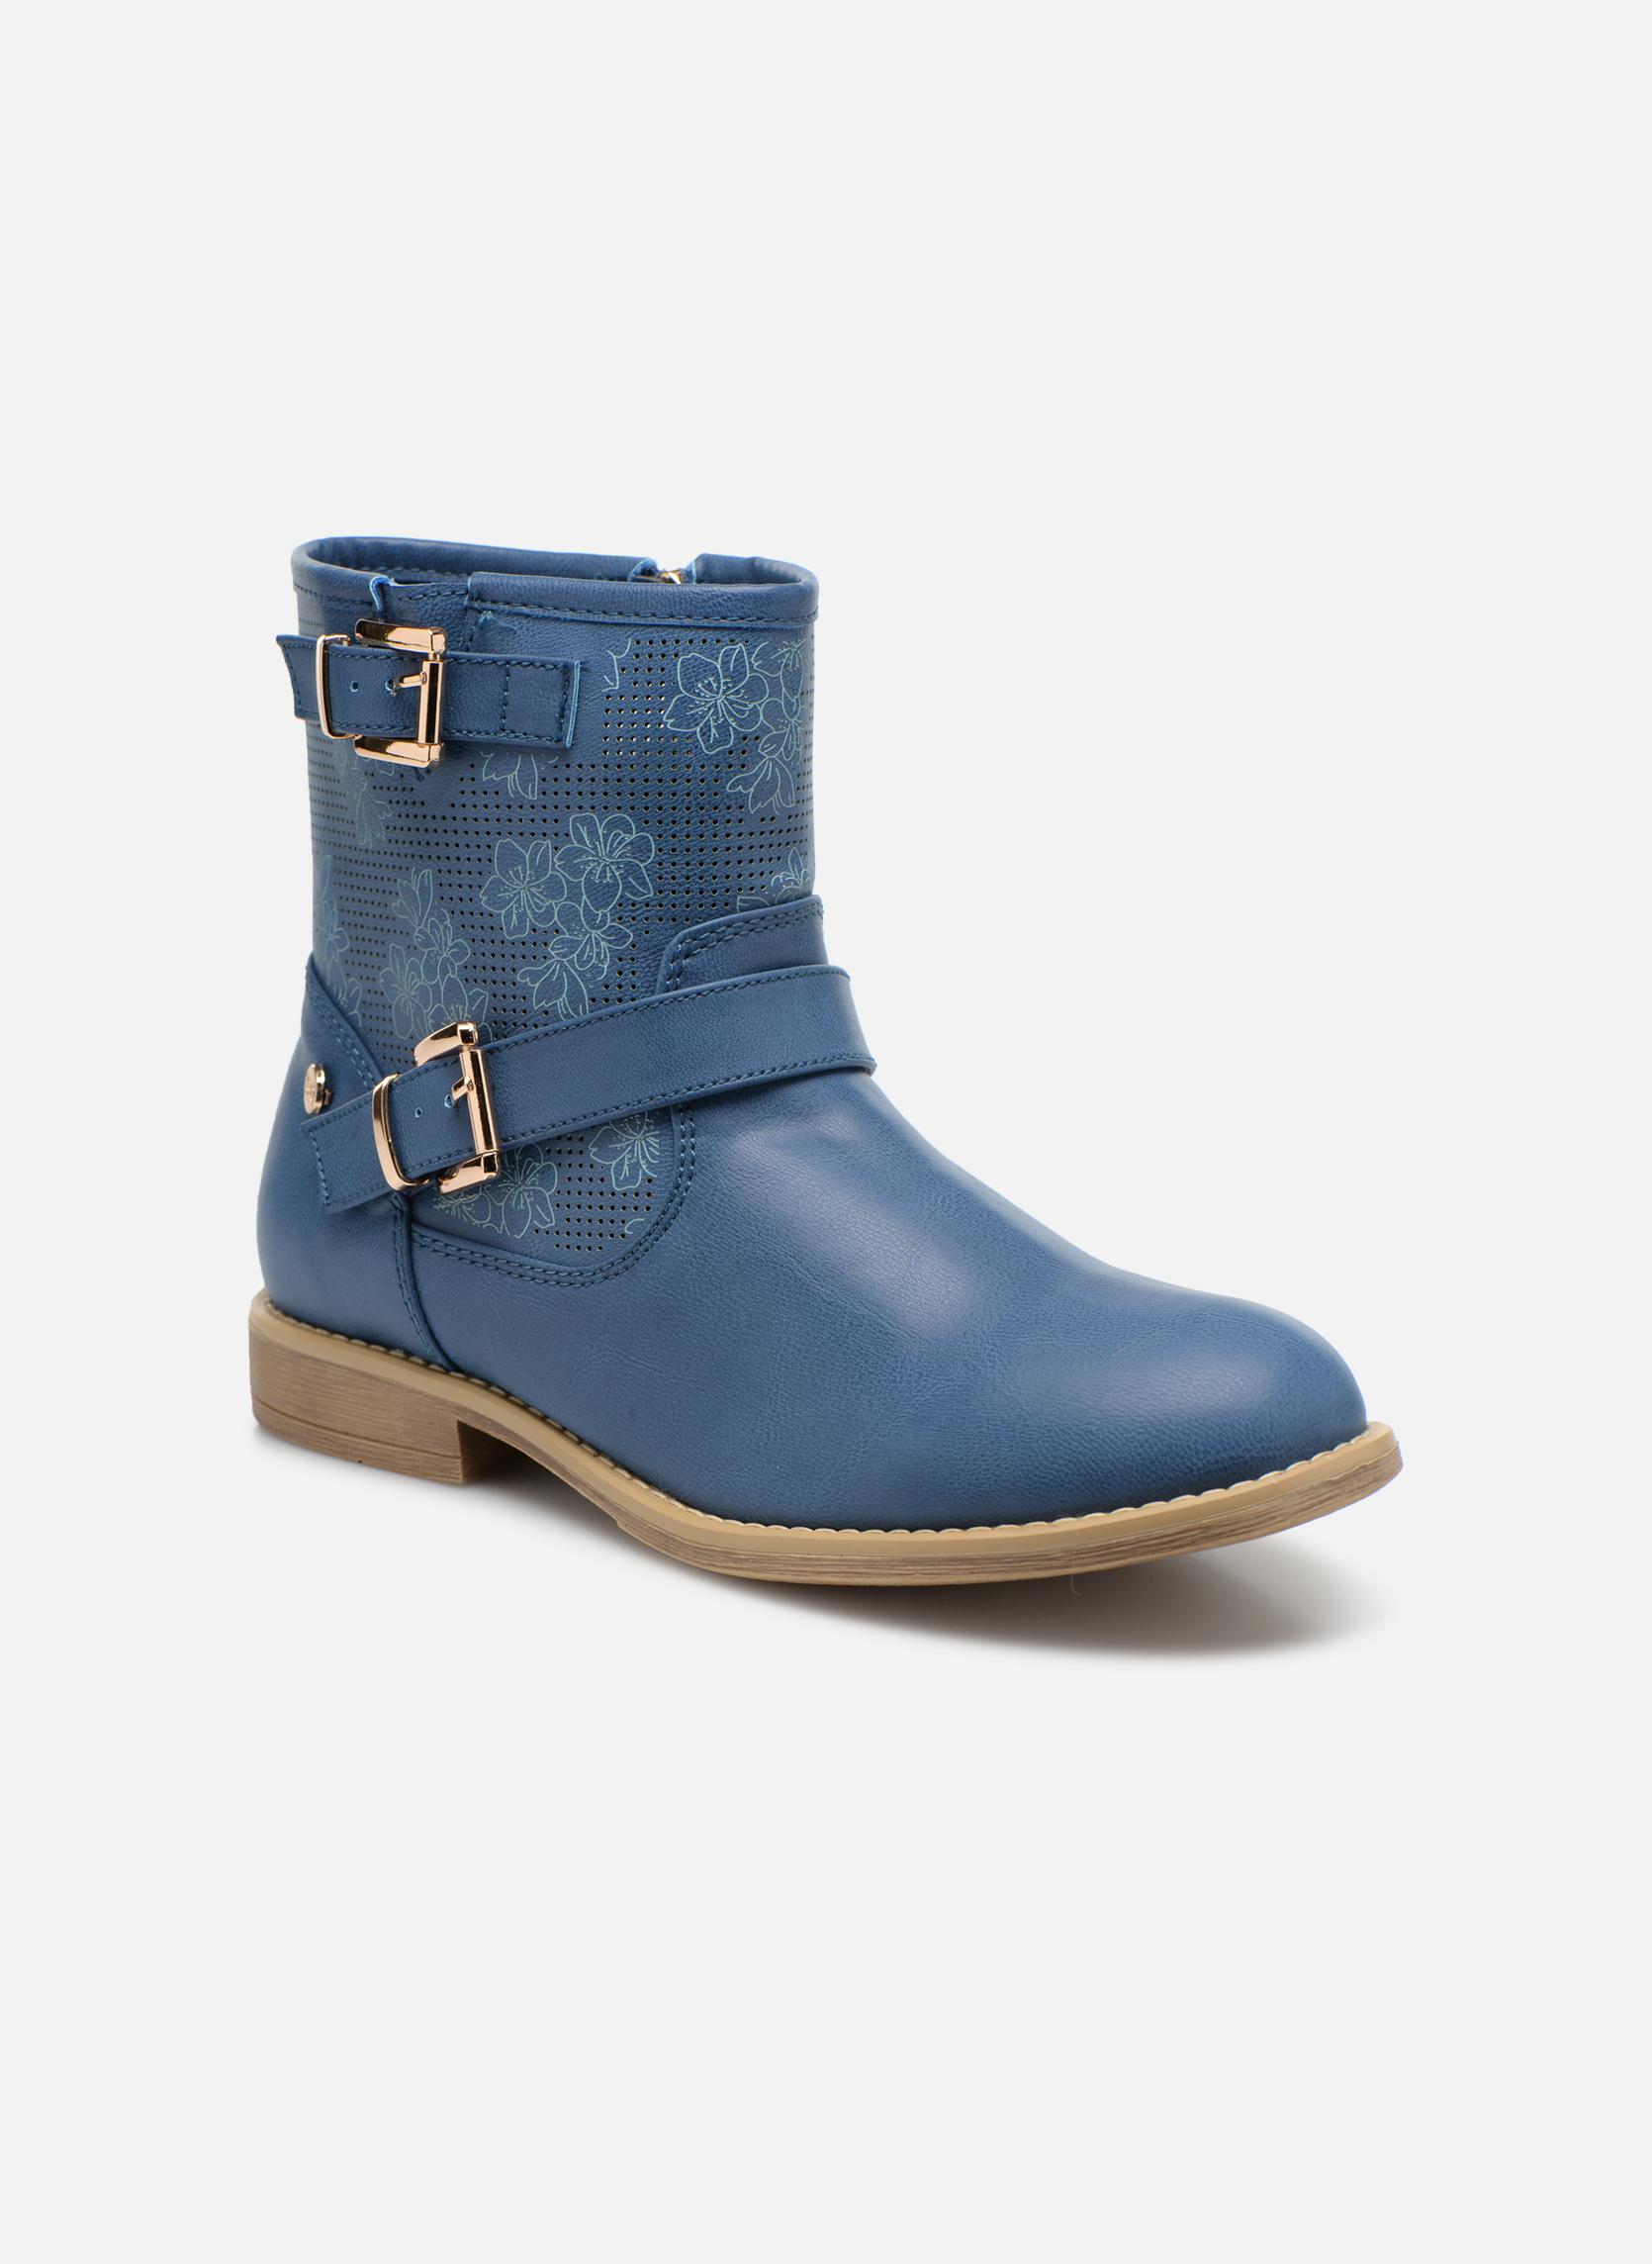 Marques Chaussure femme Xti femme Randy 45017 Jeans